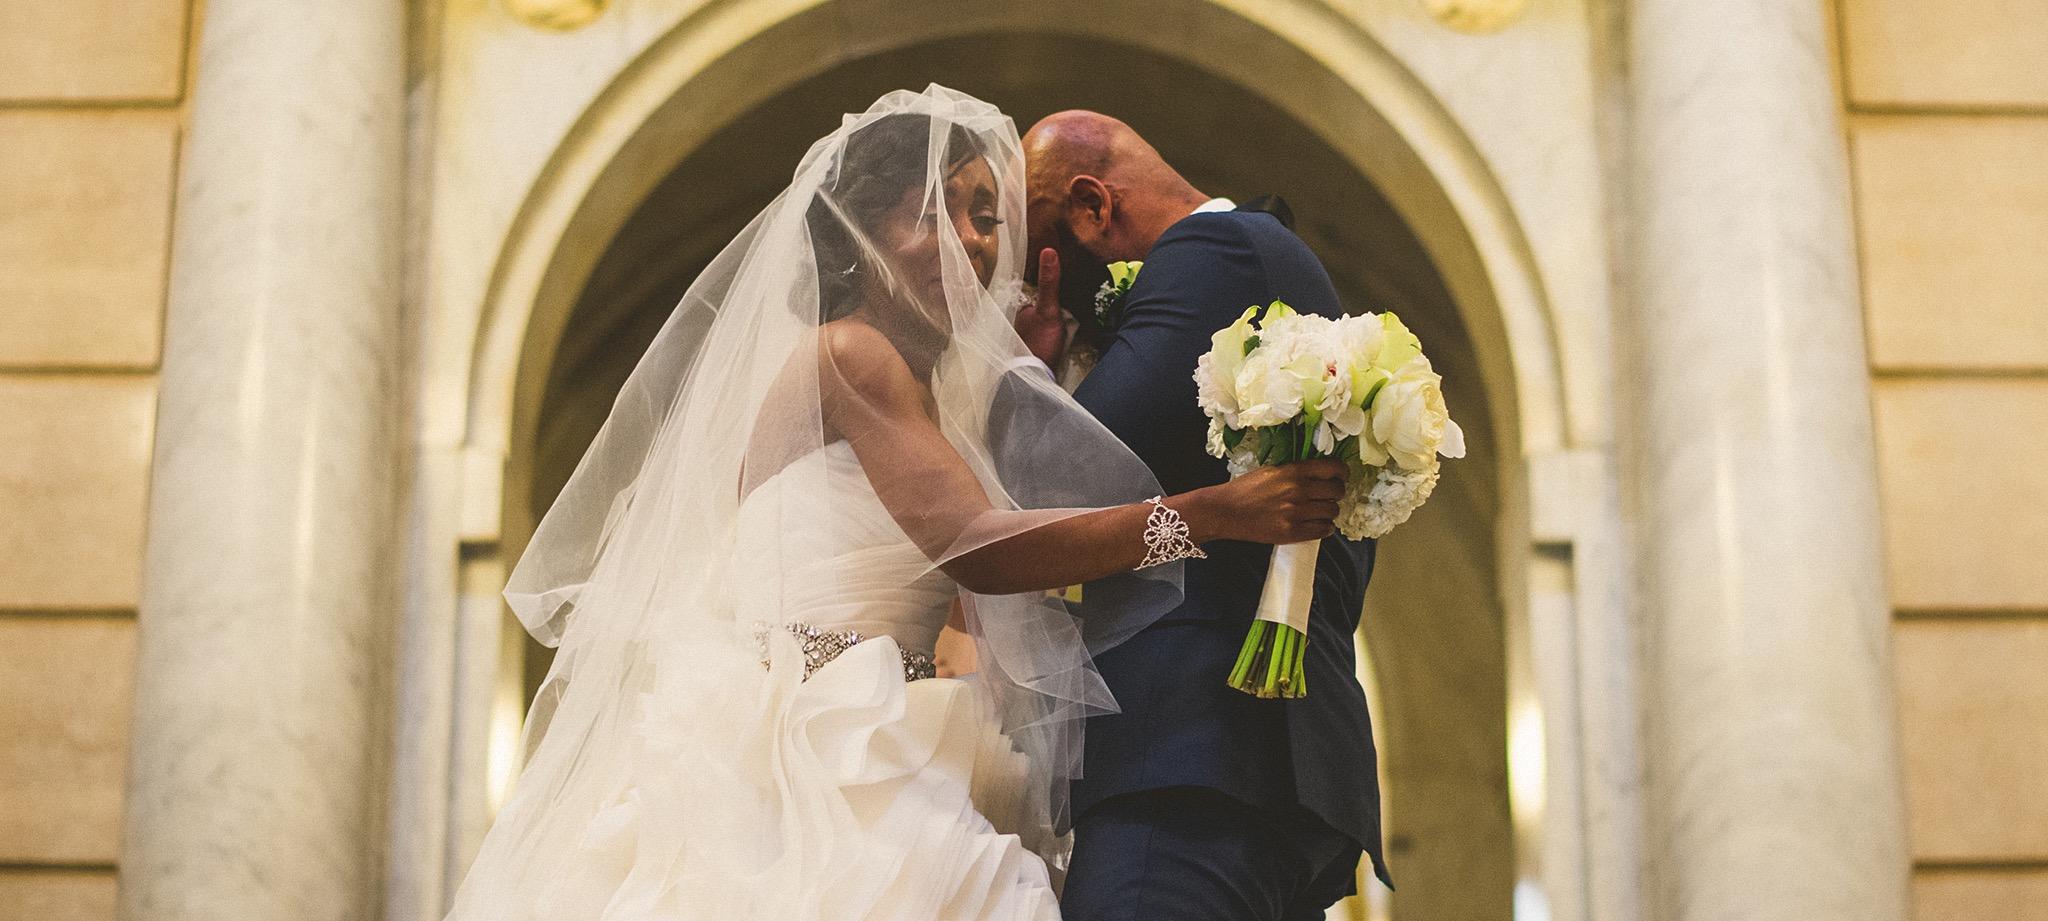 42-emotin-wedding.jpg